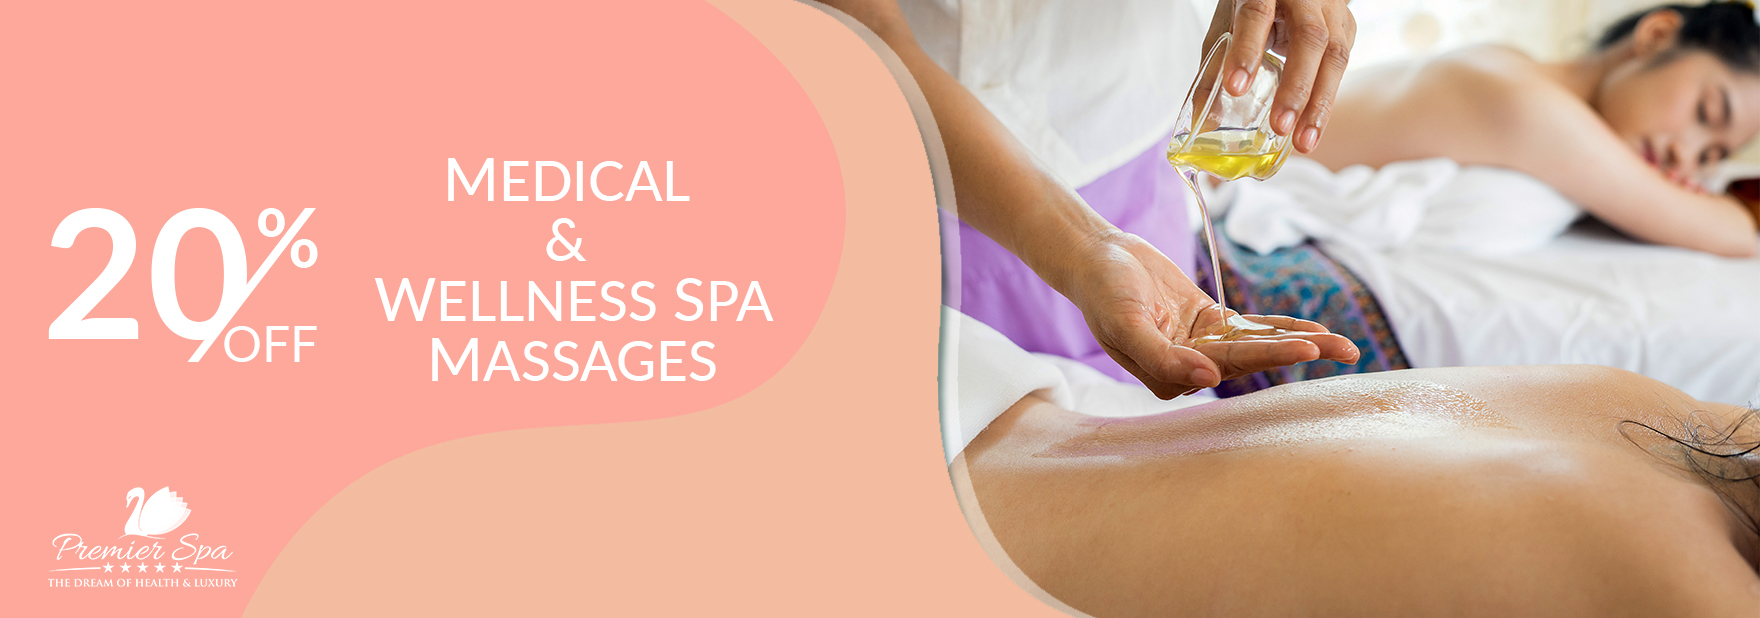 Oferta 1-8 Martie Martisor 2019 Premier Palace Spa Hotel 20% discount medical & wellness spa massages